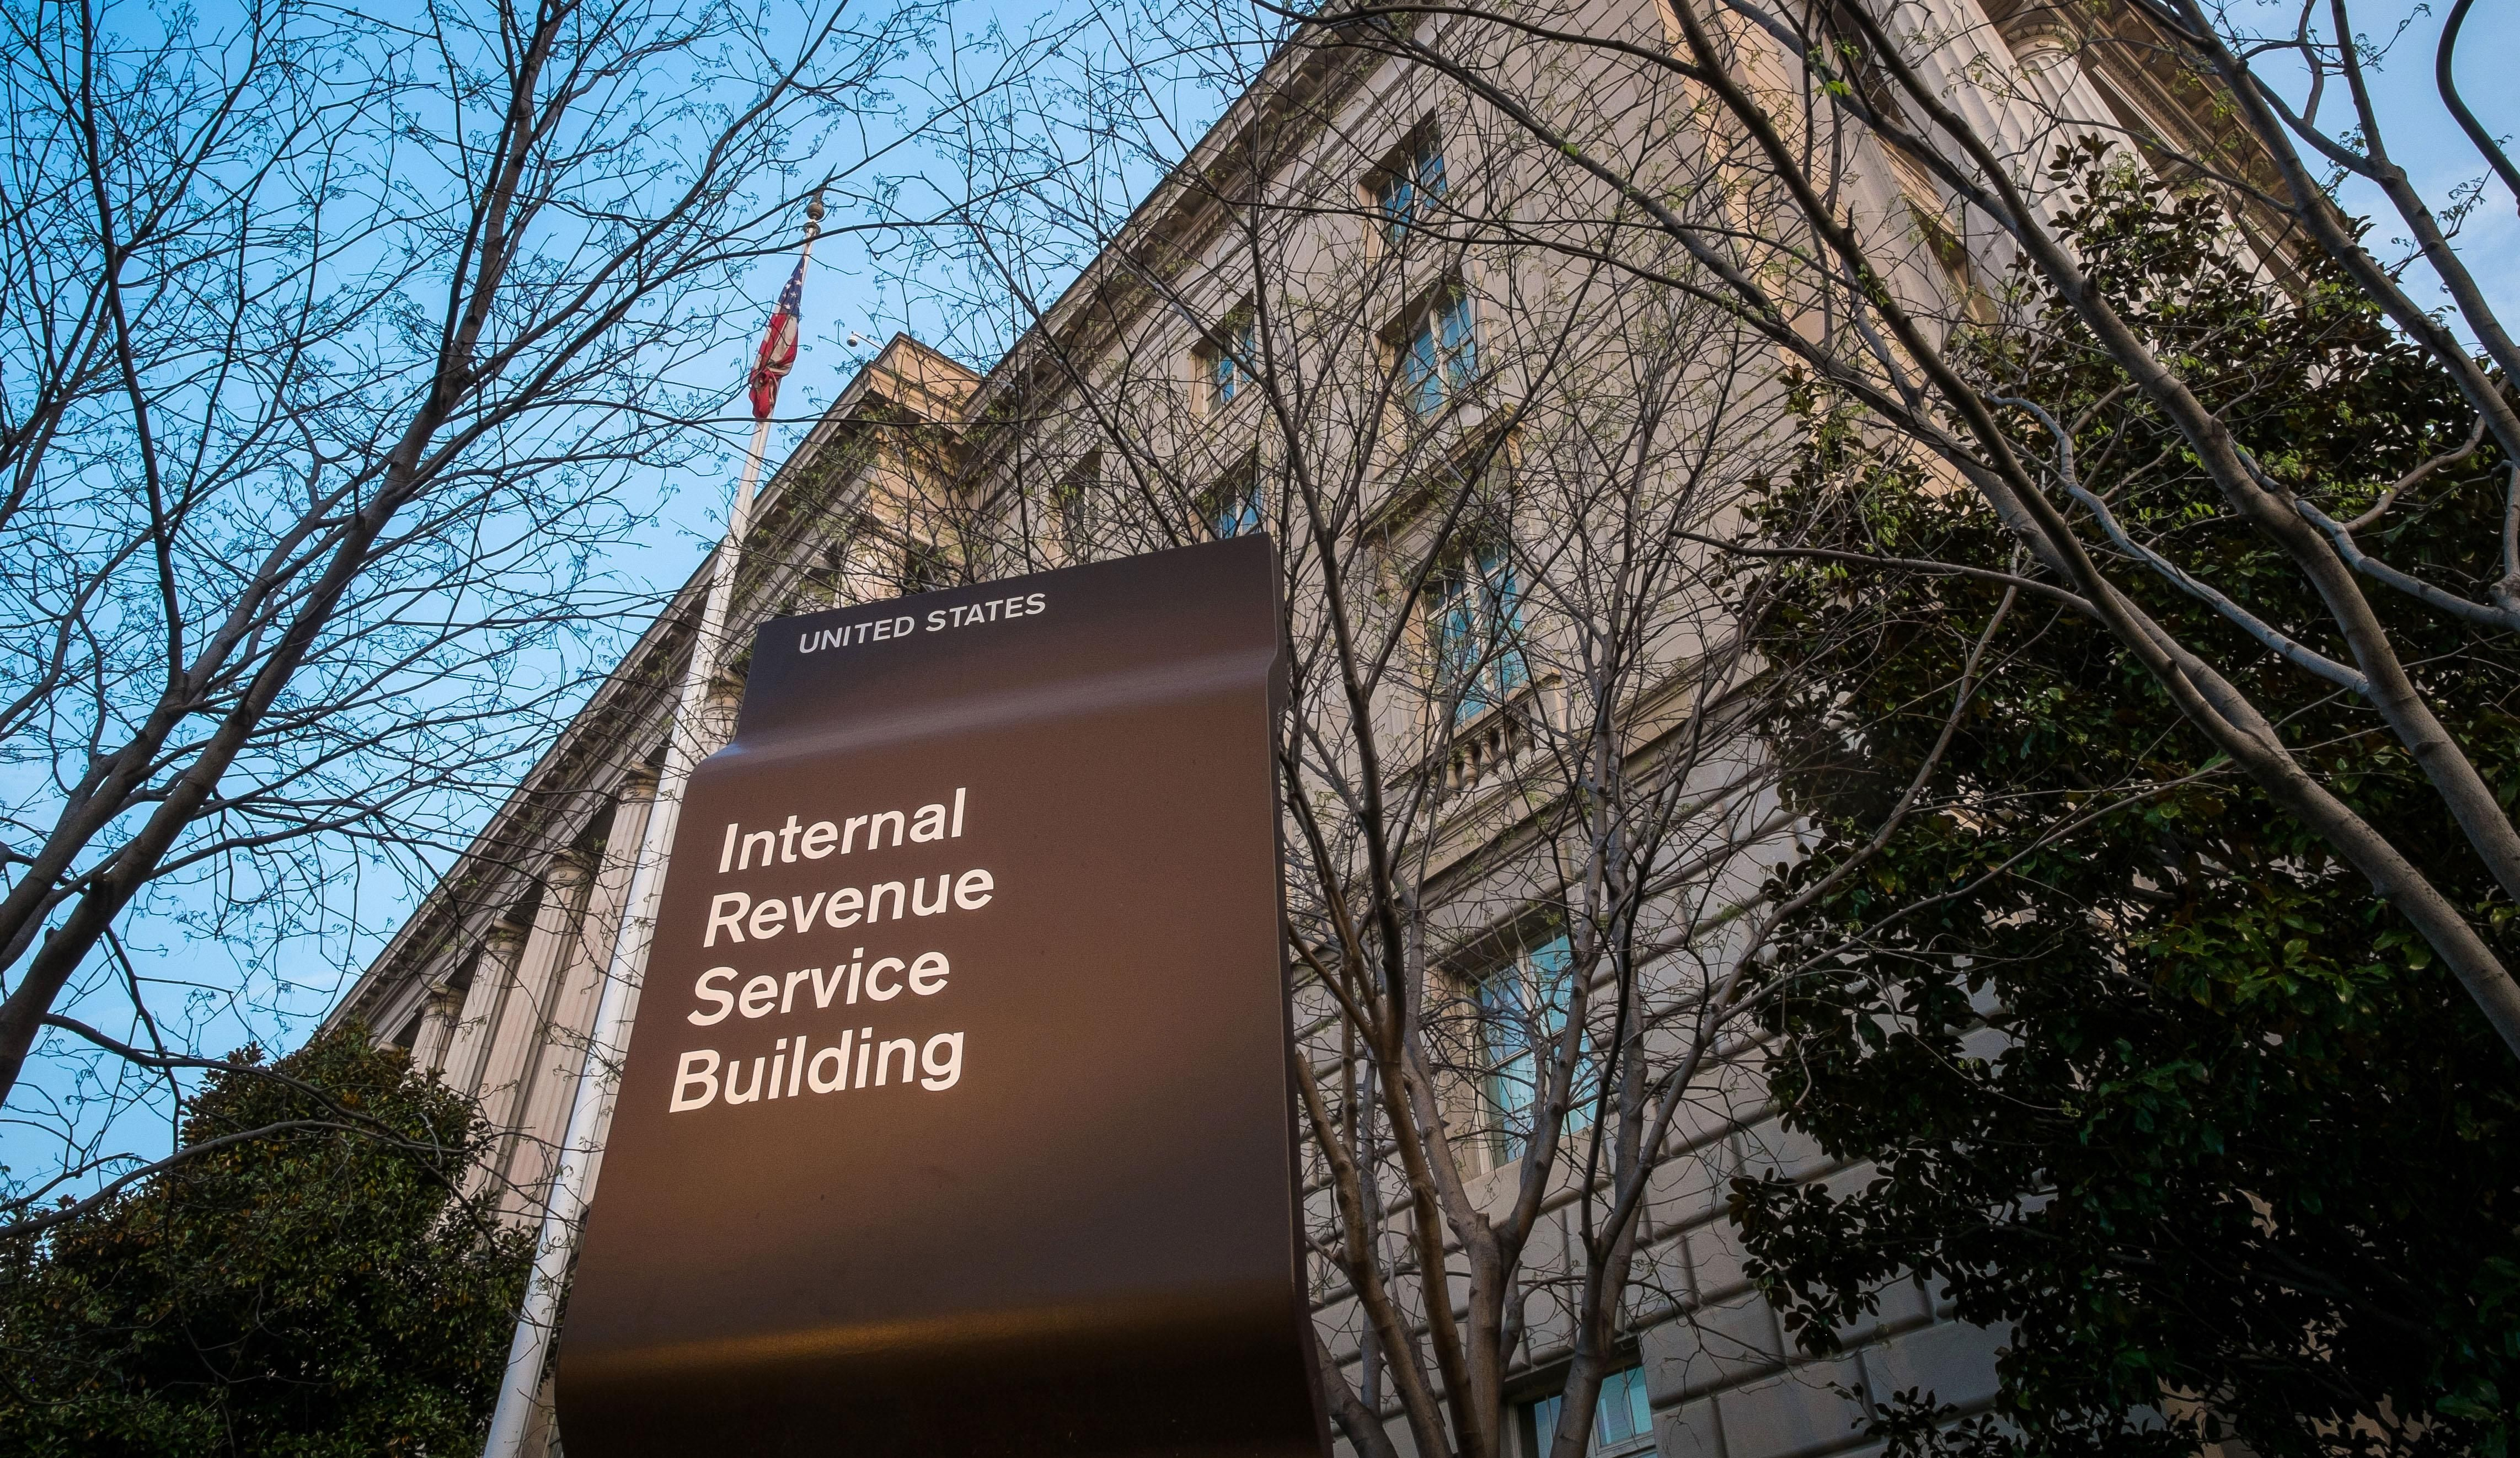 IRS wasted 5.6B on bogus Obama stimulus tax credits